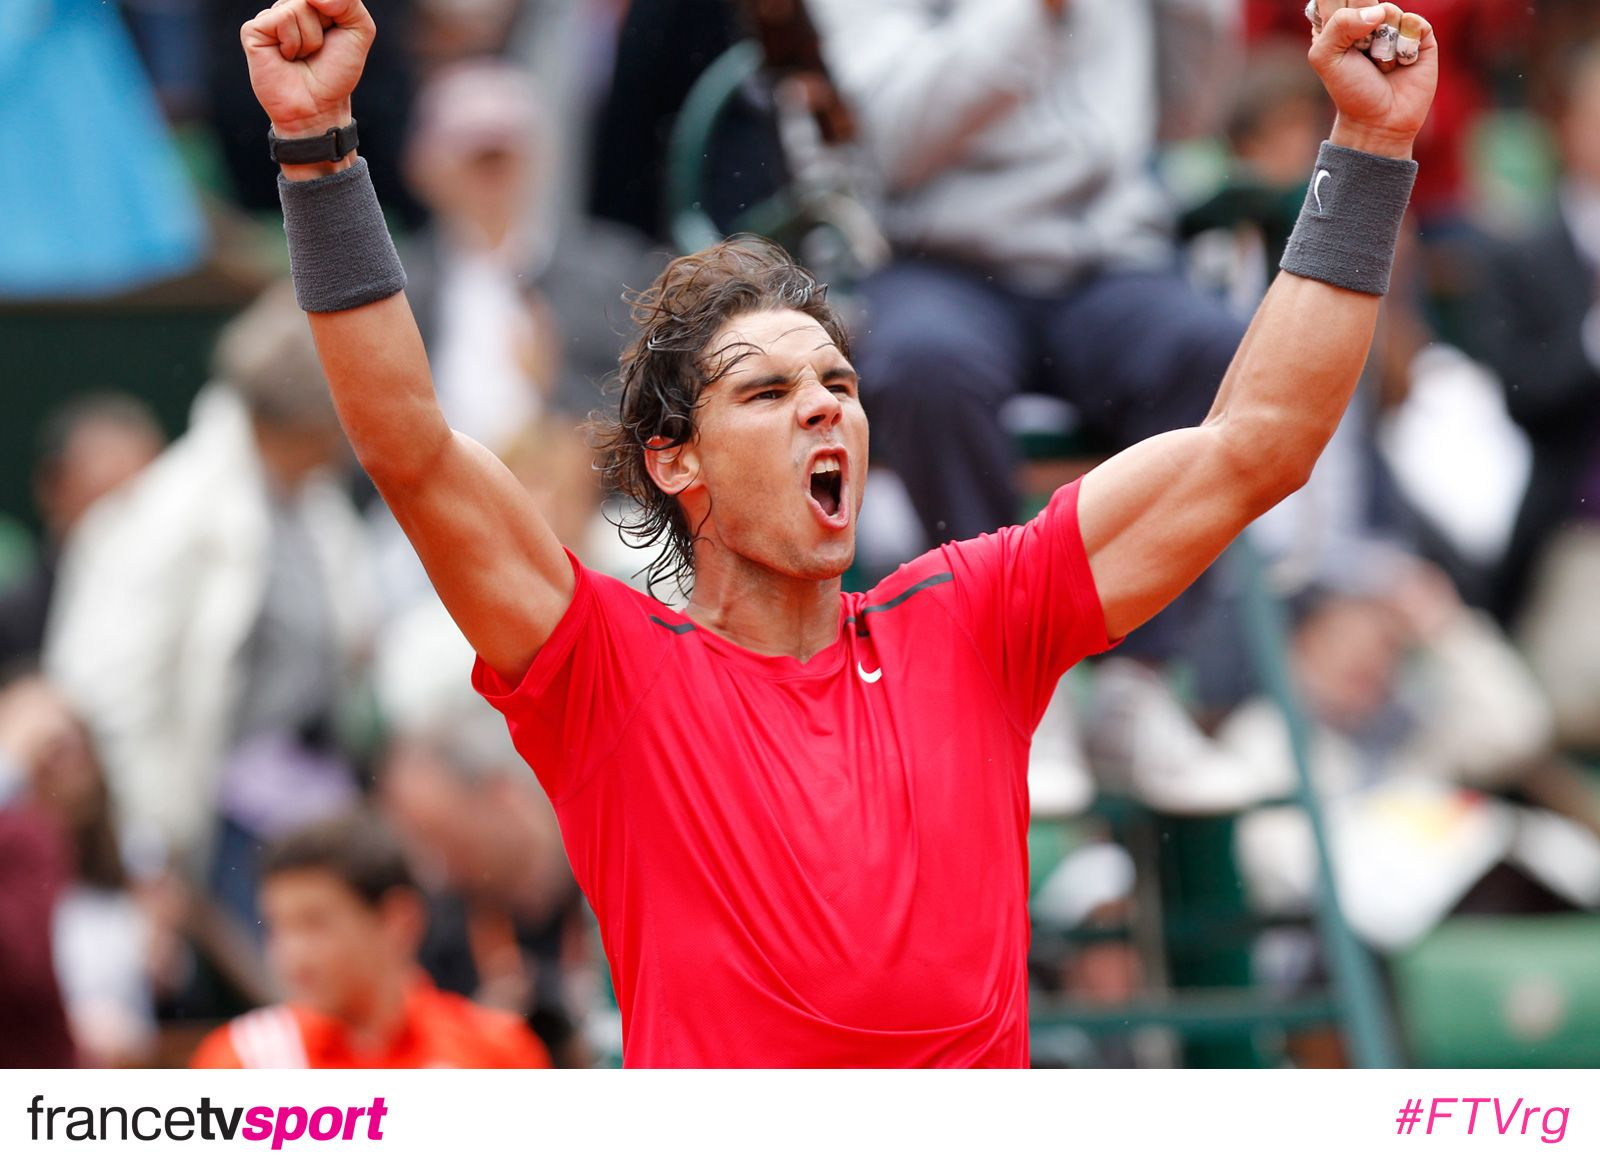 Rafael Nadal arrivera en finale en n'ayant concédé